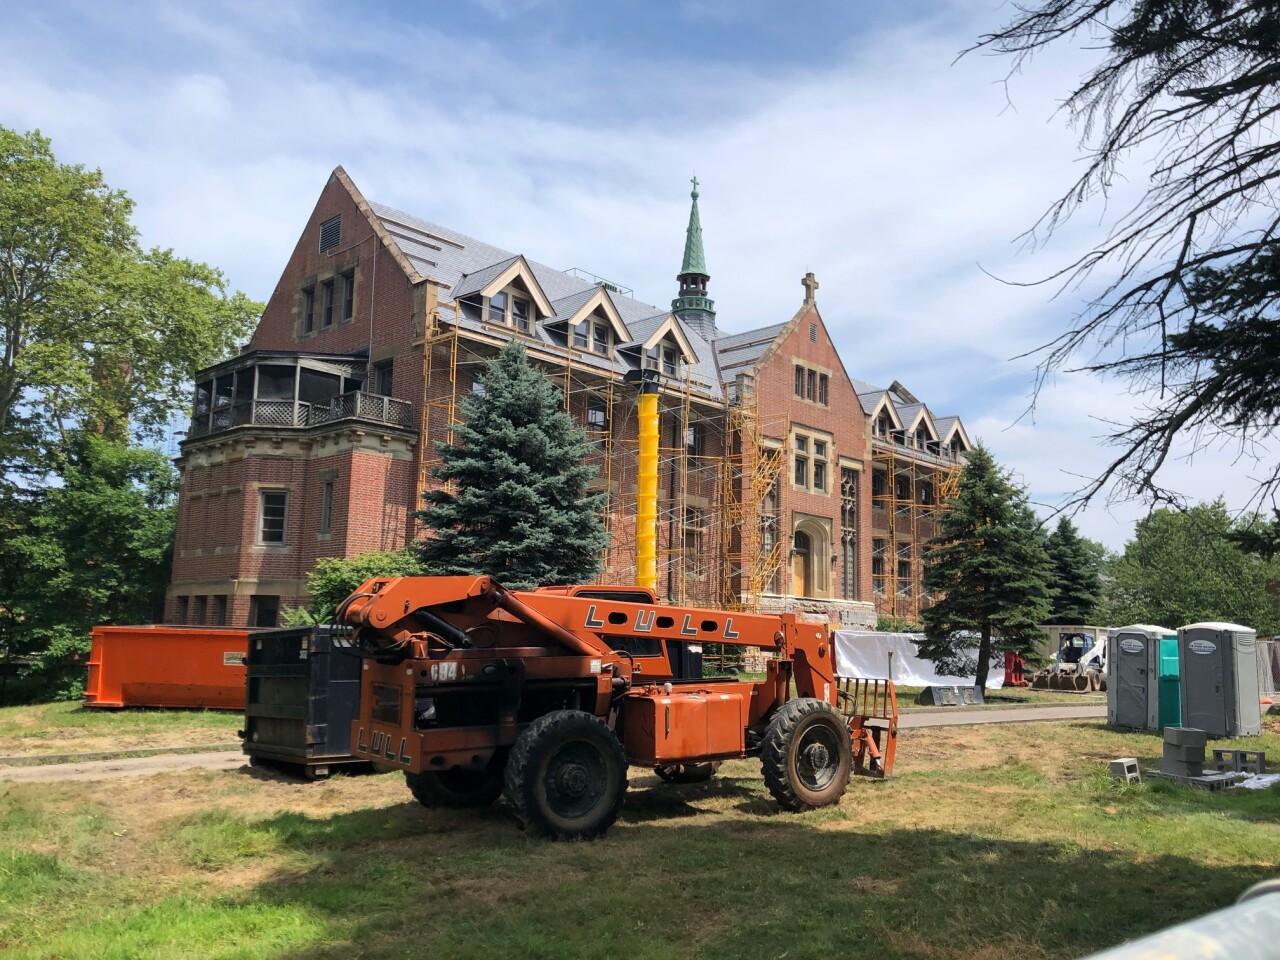 St. Joseph Academy undergoes renovations